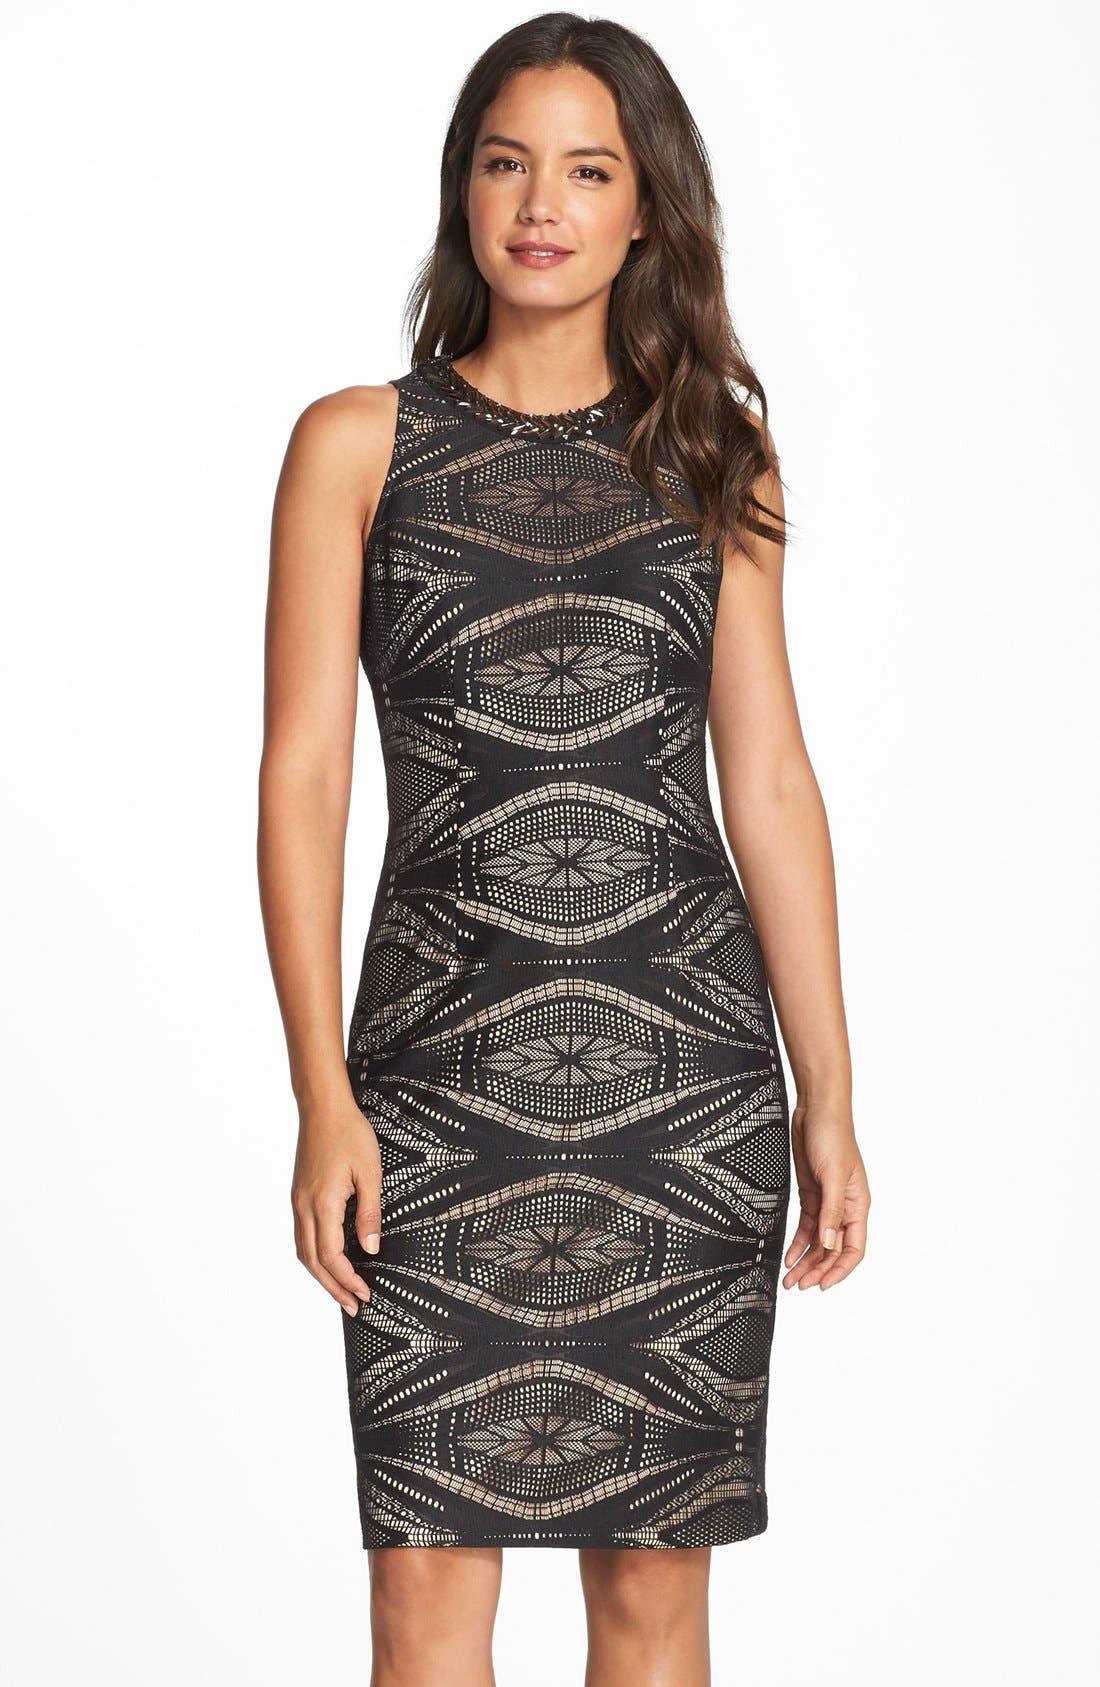 Alternate Image 1 Selected - Maggy London Embellished Lace Sheath Dress